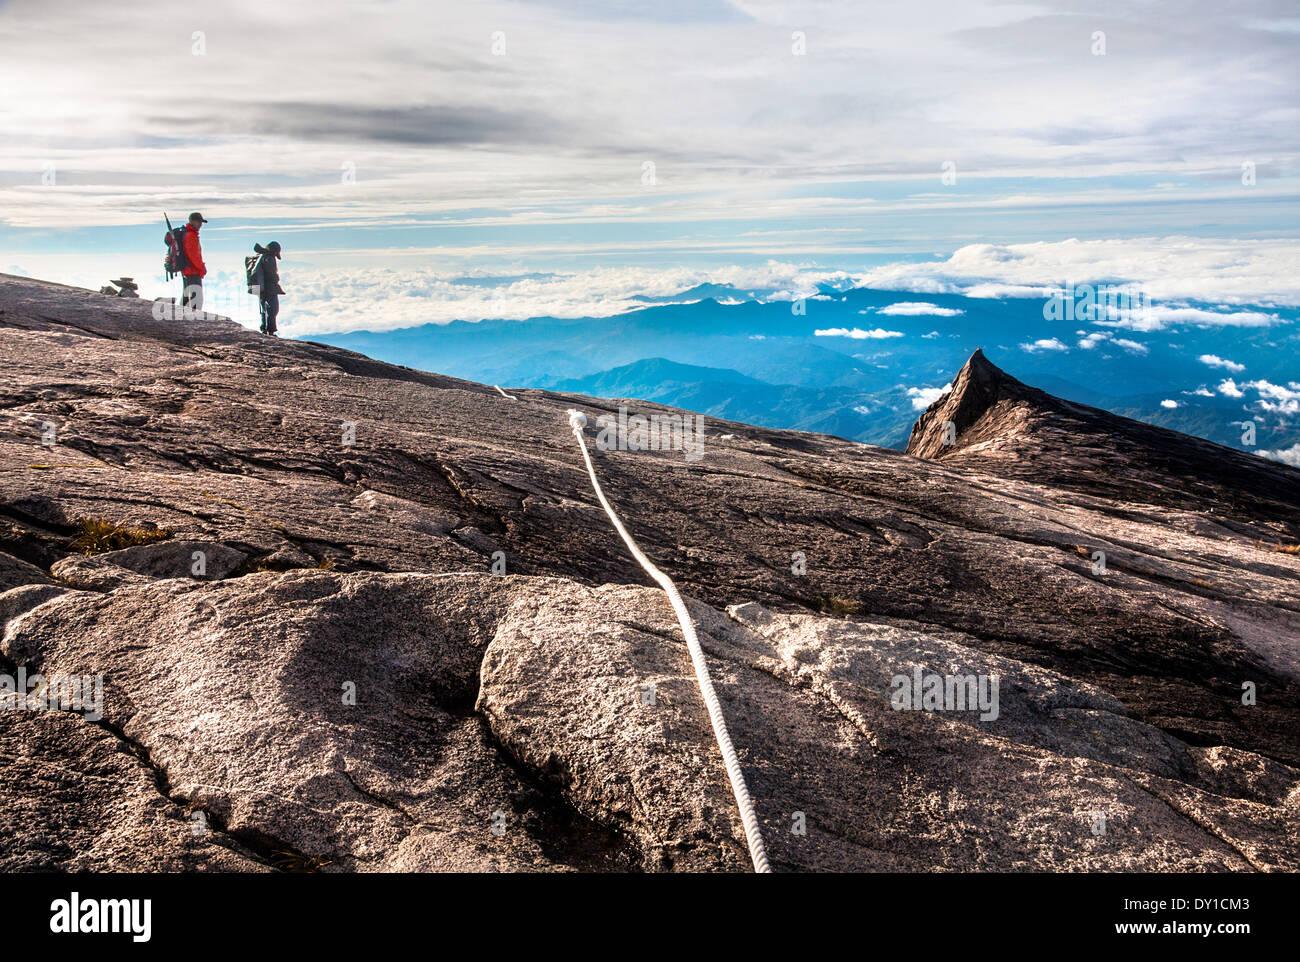 Tourists hike down Mount Kinabalu on February 16, 2012 in Kota Kinabalu,Malaysia - Stock Image